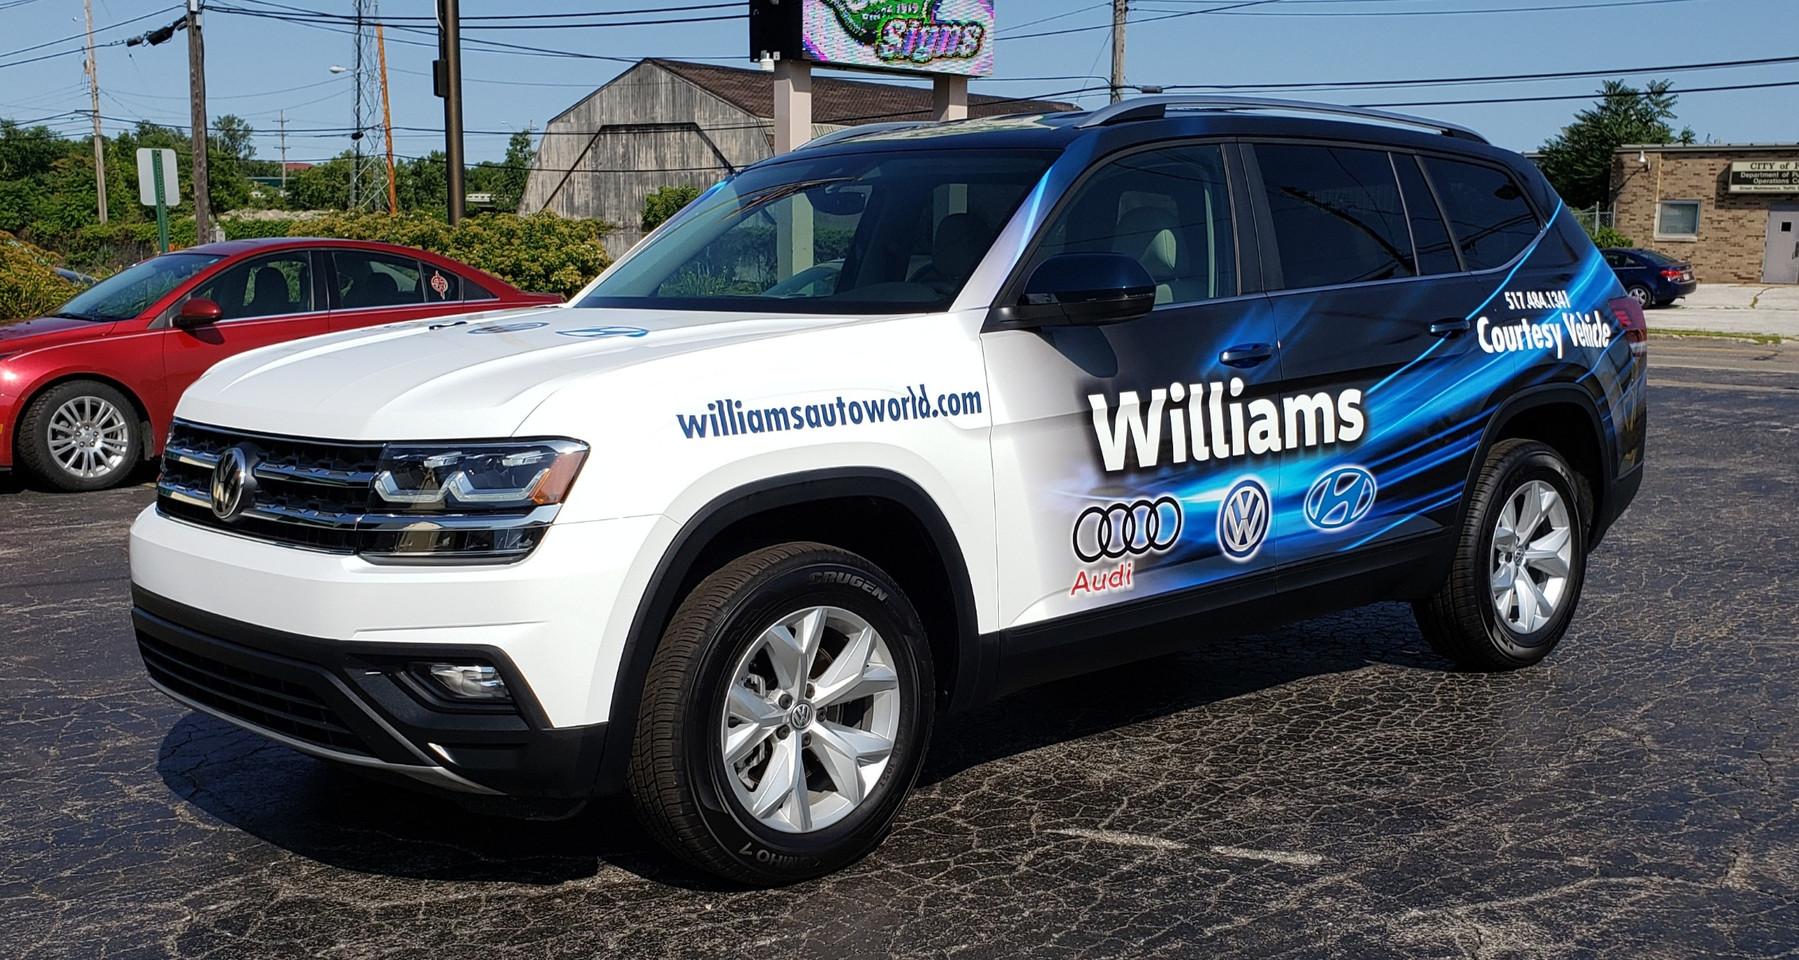 Williams Autoworld